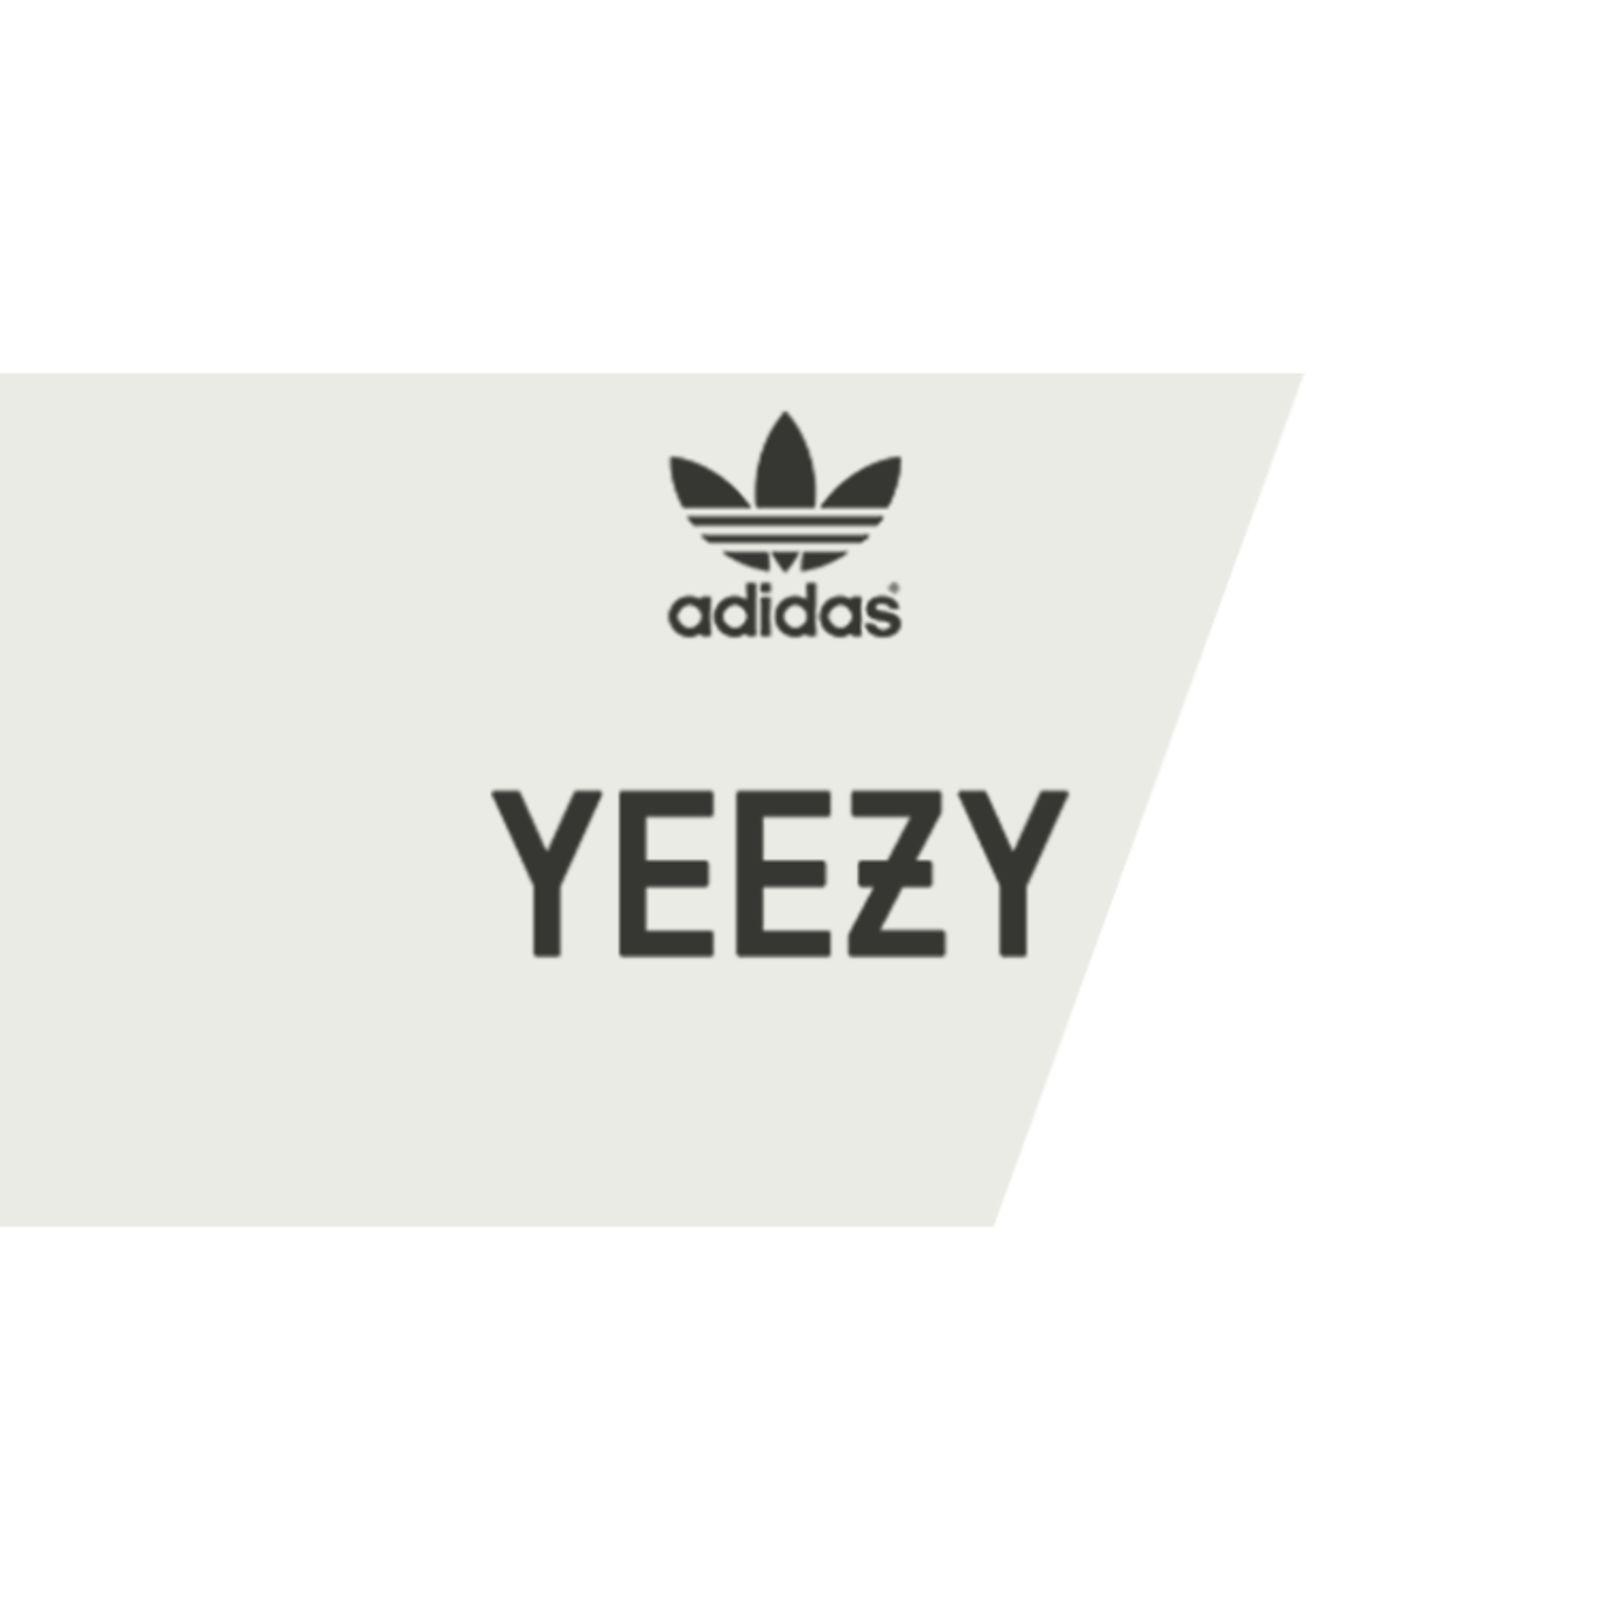 YEEZY adidas Originals x Kanye West (Bild 1)